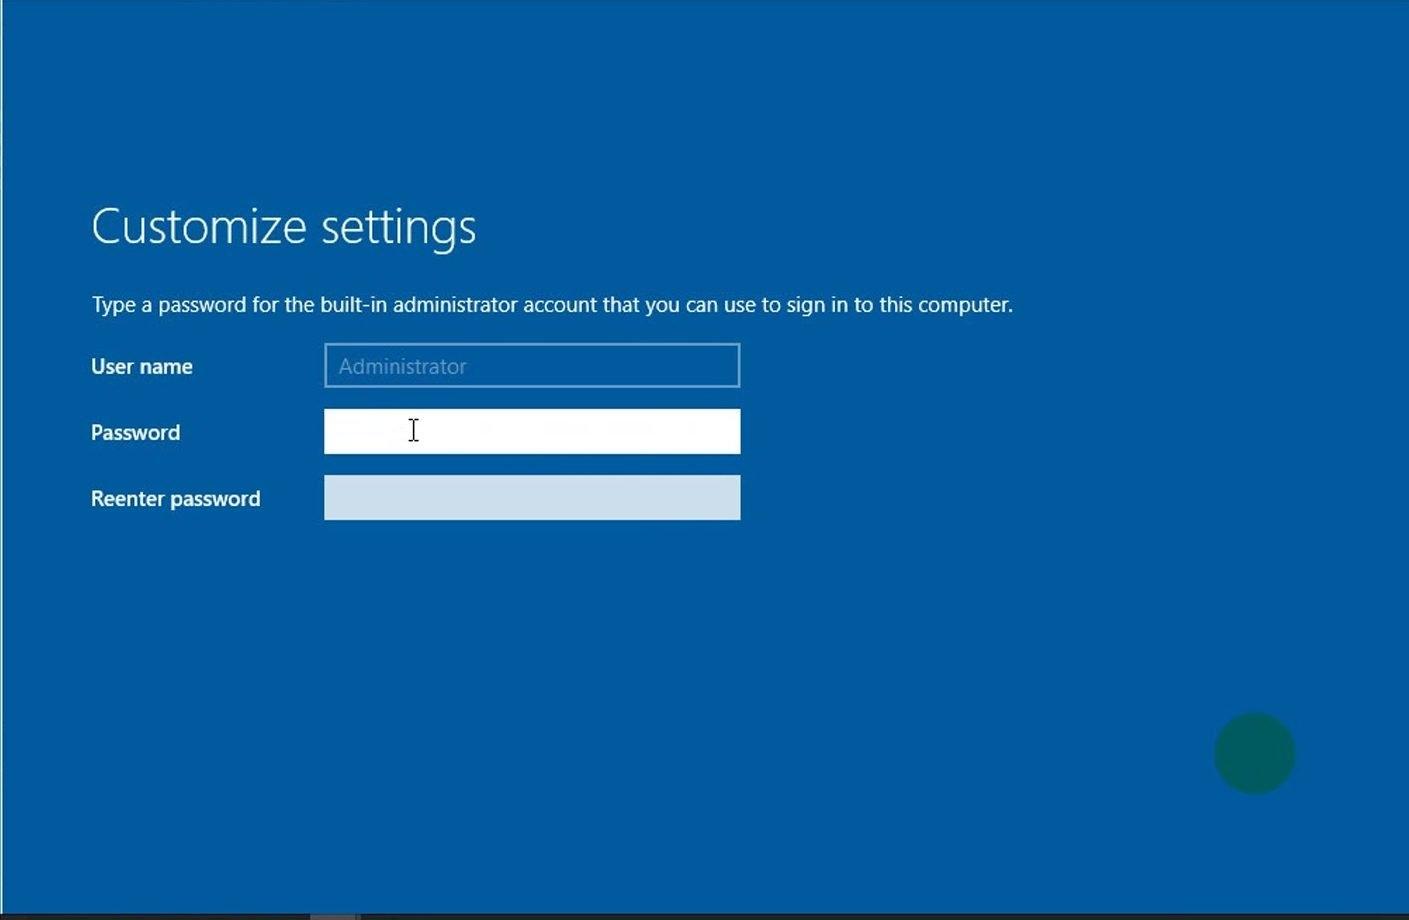 ITFORVN Bài 1 Part1 Cài đặt Windows Server 2016 32 e1491171922411 - [Tự học MCSA MCSE 2016] - Lab-1-Part1-Cài đặt Windows Server 2016